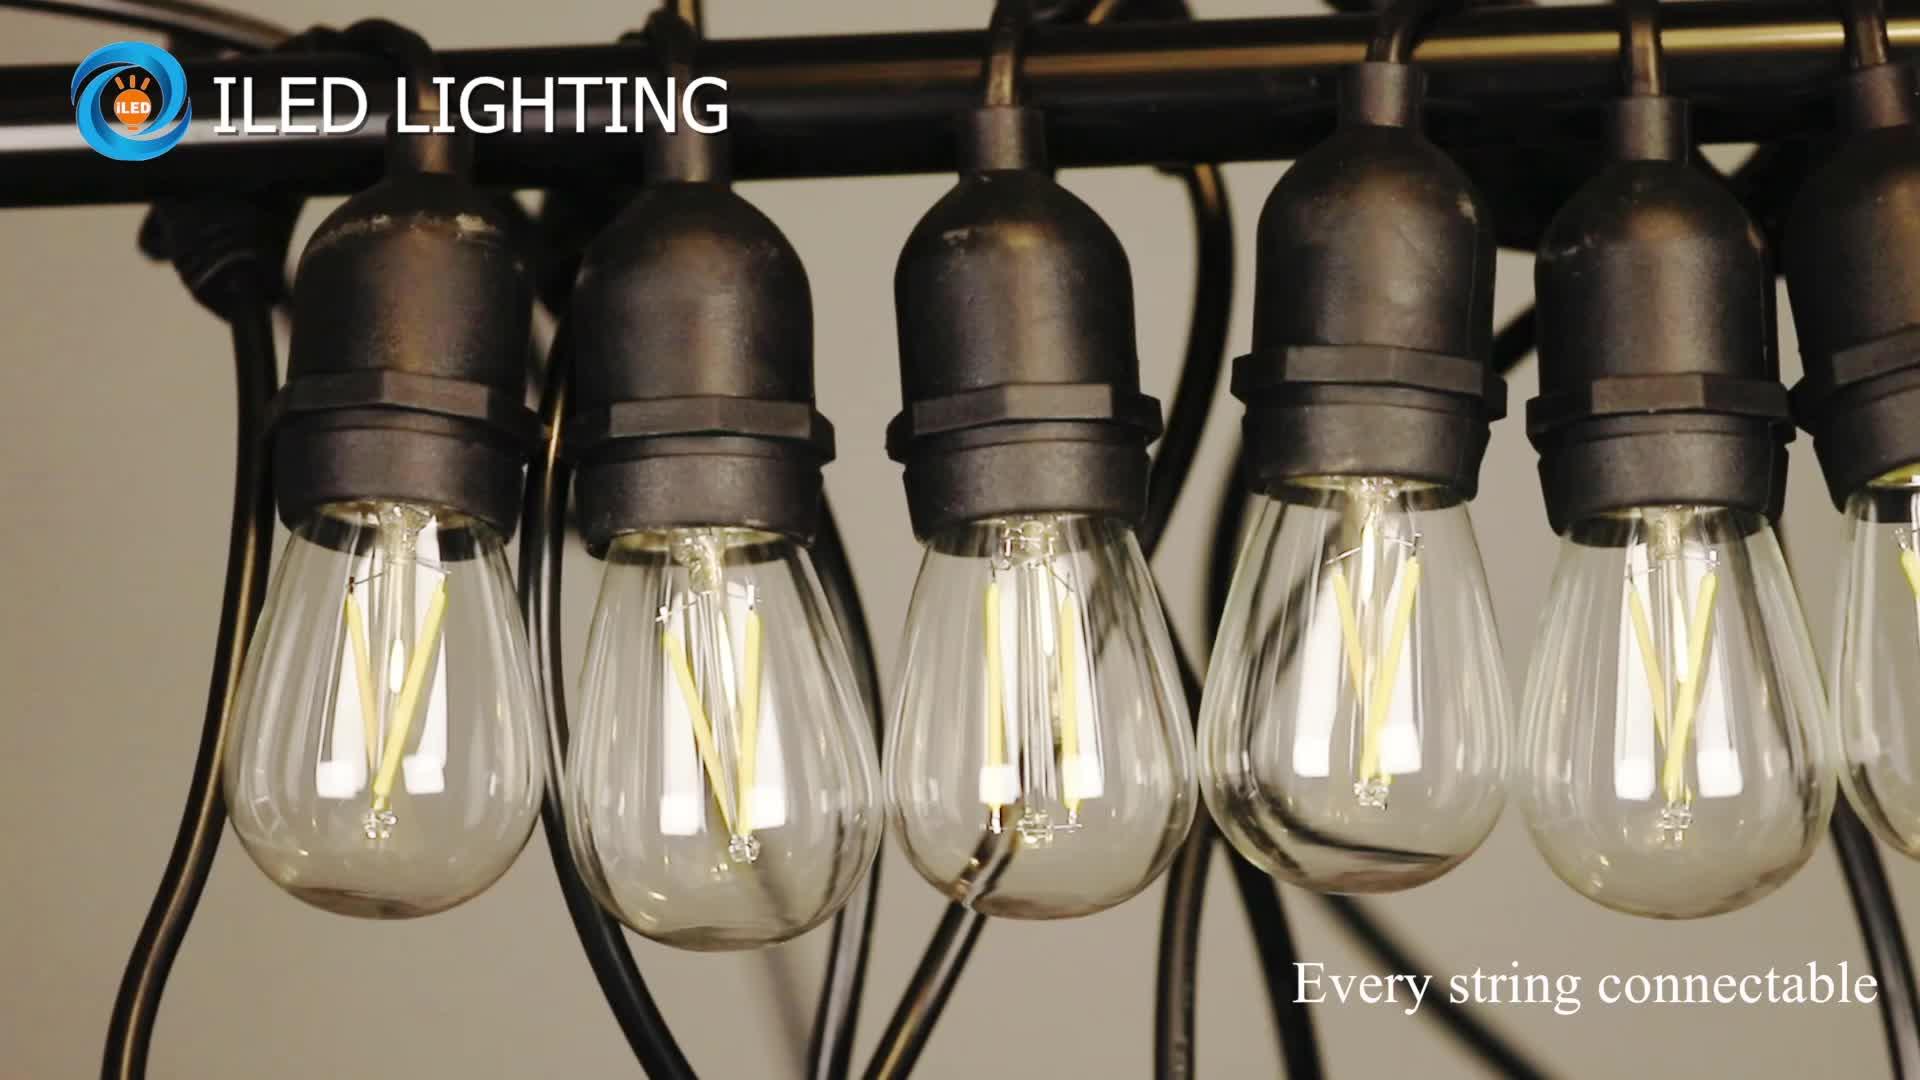 48 Feet Long In Stock Outdoor String Lights with Hanging sockets, Weatherproof Commercial Heavy Duty Festoon Garden Lights